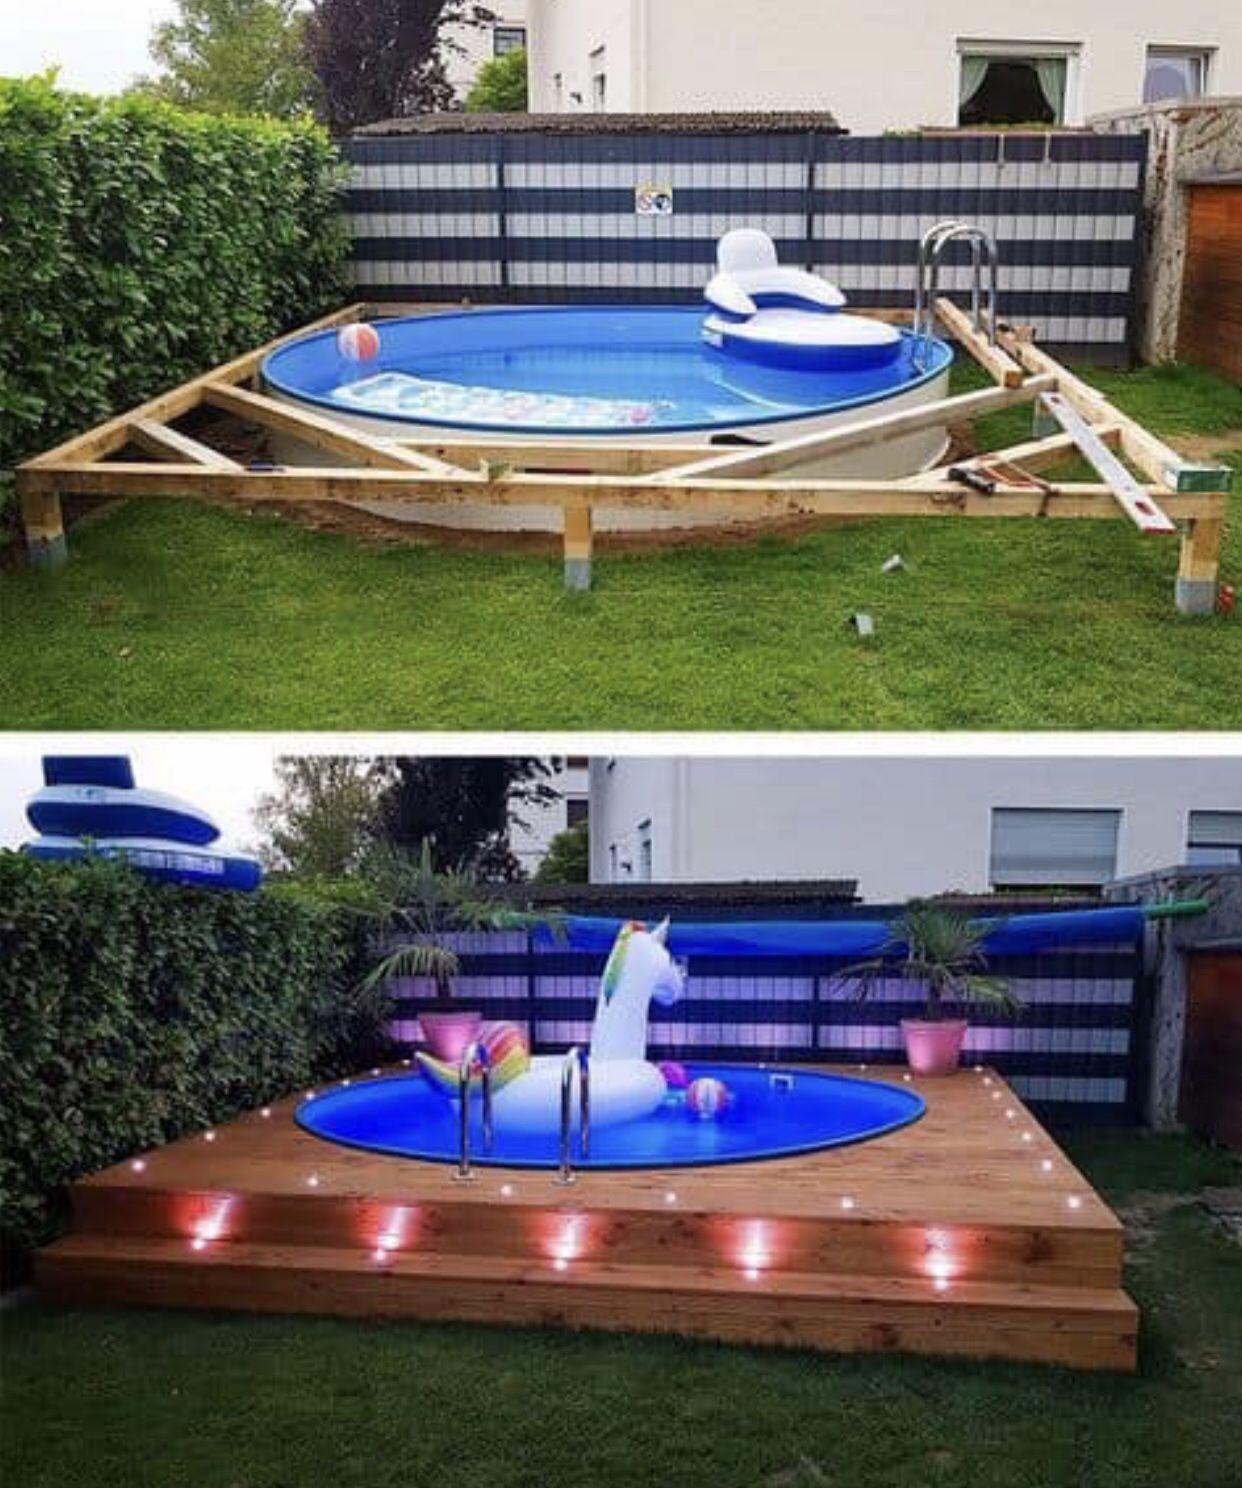 Pool ideas | Diy swimming pool, Backyard decor, Backyard